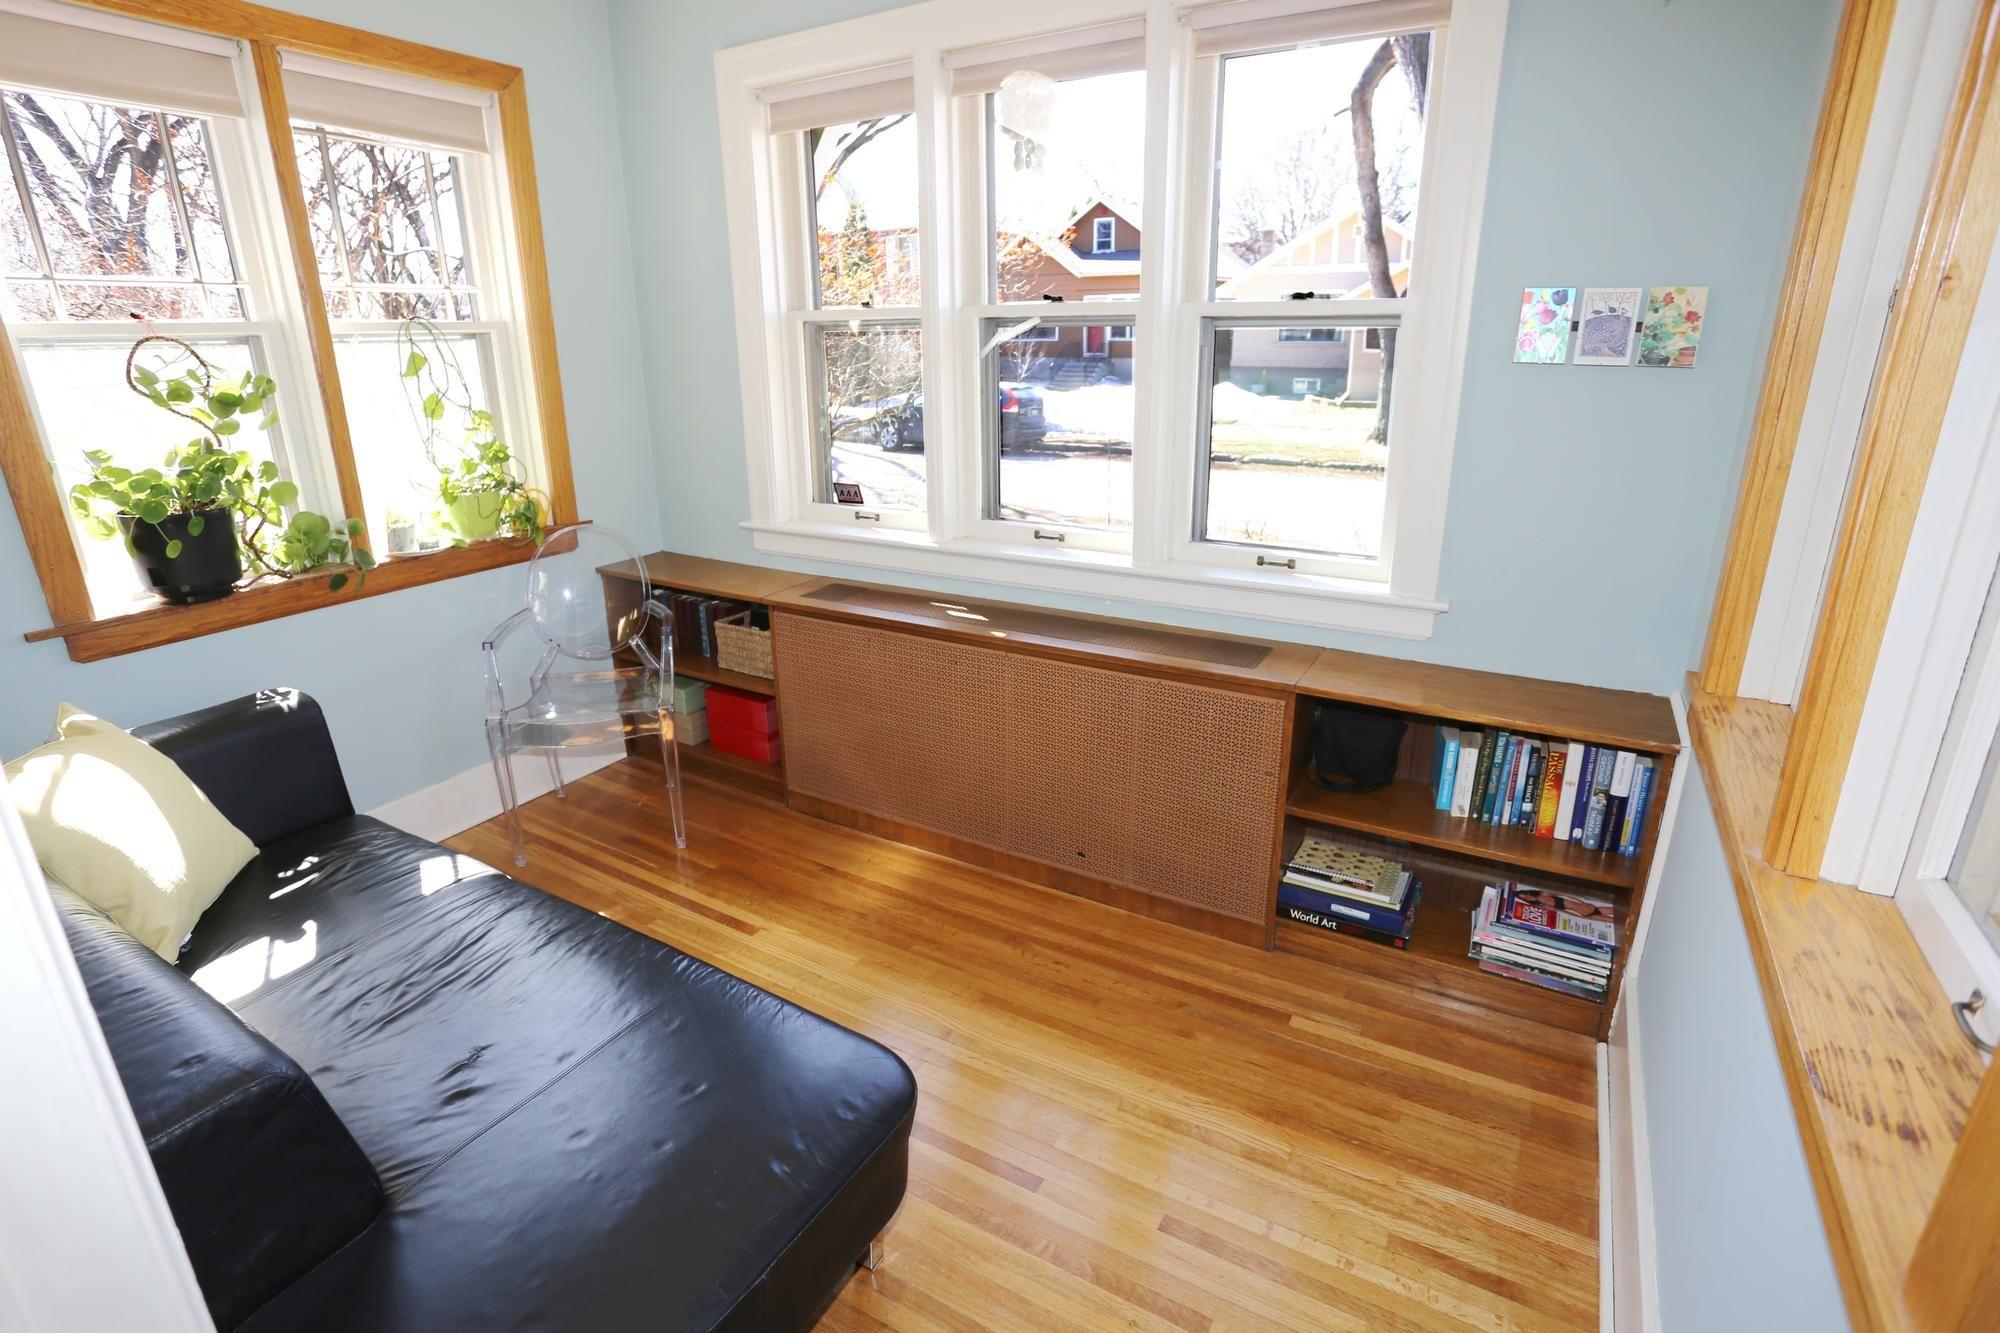 Photo 14: Photos: 109 Garfield Street South in Winnipeg: Wolseley Single Family Detached for sale (5B)  : MLS®# 1808340